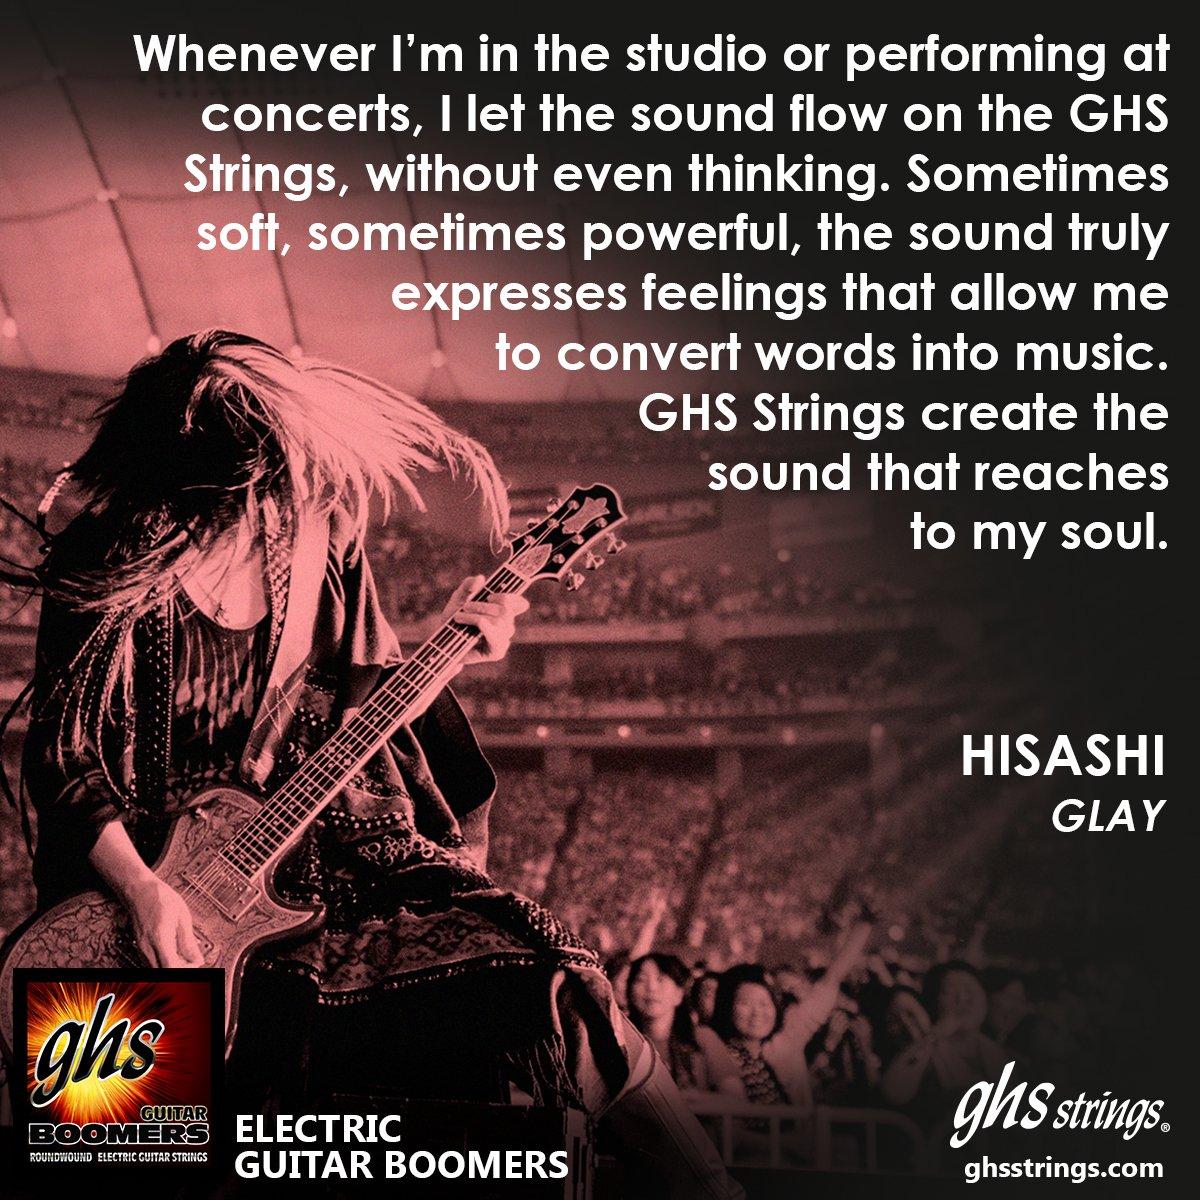 Here's the newest addition to #GHSArtistQuotes - @HISASHI_! @GHSstrings #GHS #GHSstrings @glay_official #GLAY #rock https://t.co/r0WgKprj7U